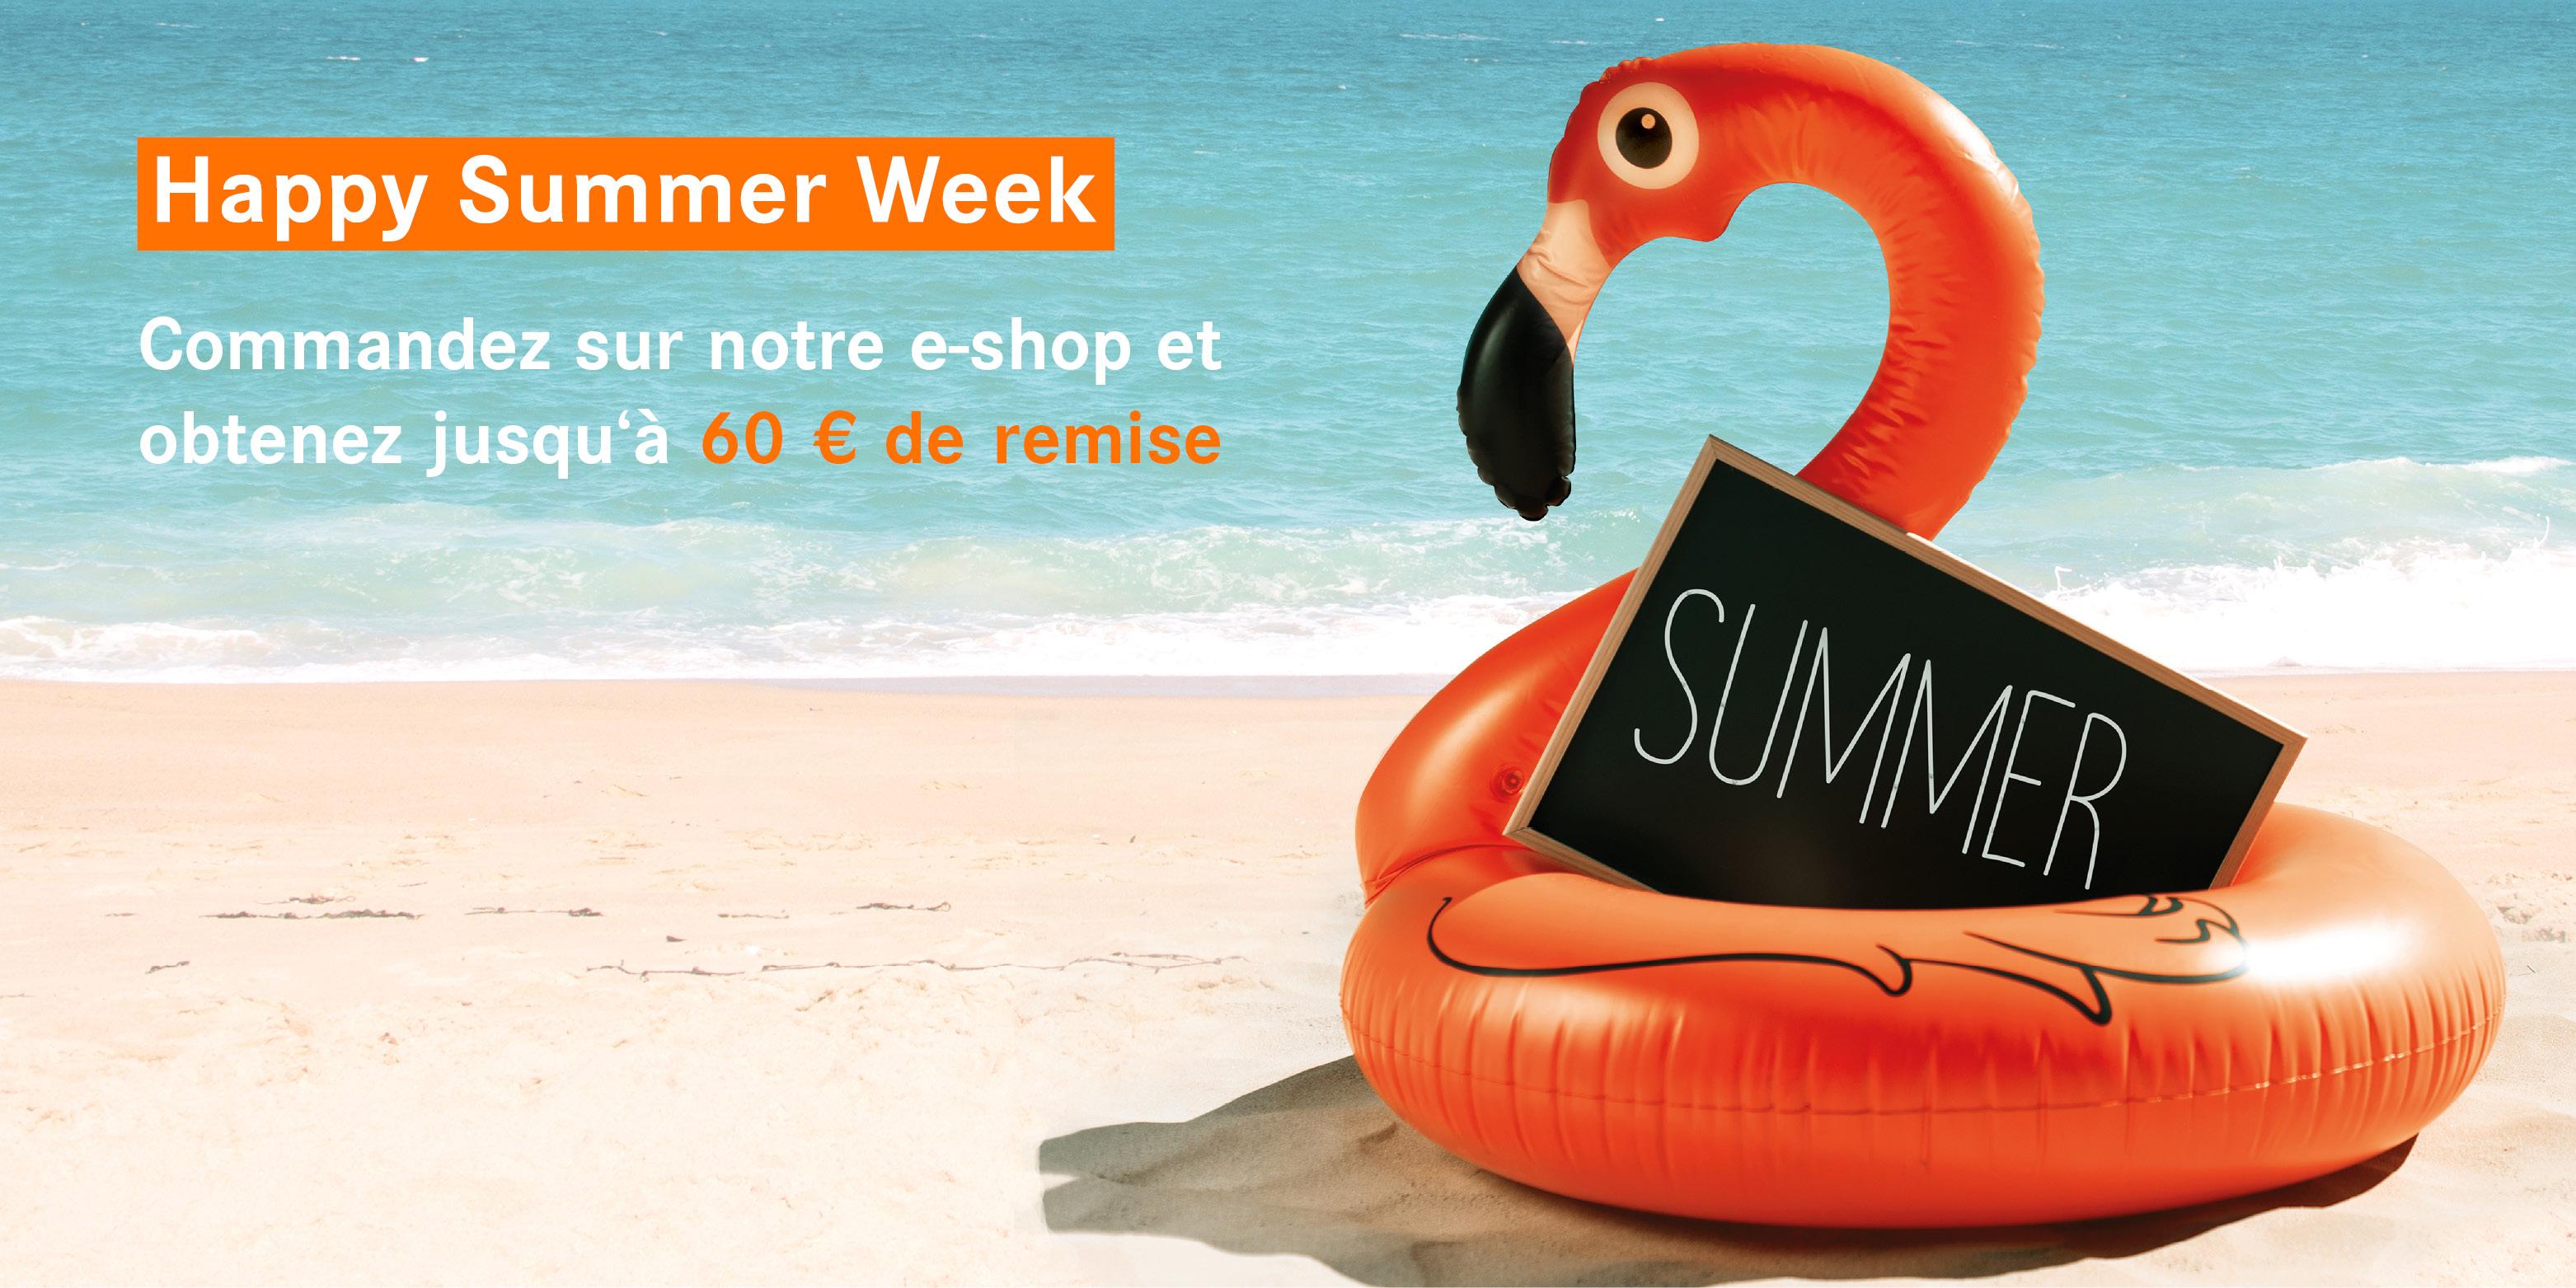 buehne summer FR 20 1500 x 750 v5